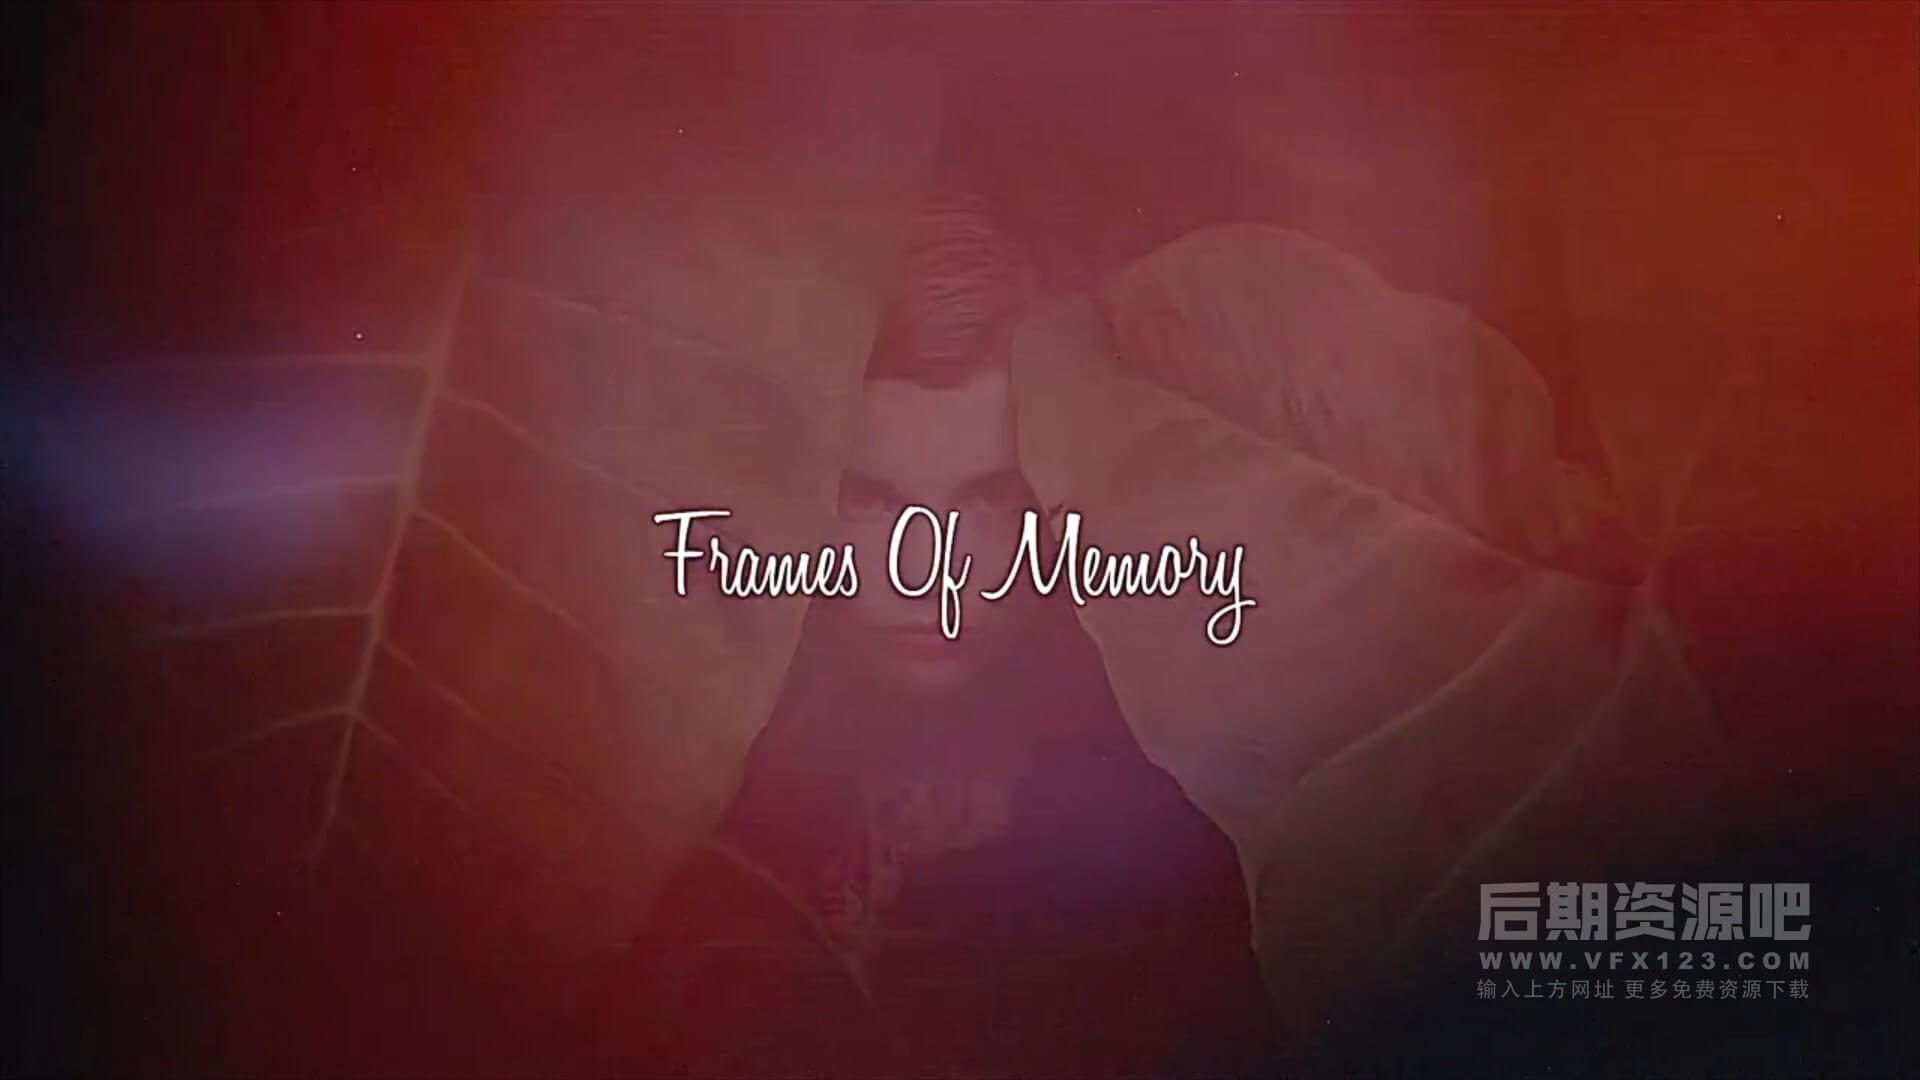 fcpx主题模板 美好记忆复古风格迷人相框相册展示模板 Frames Of Memory